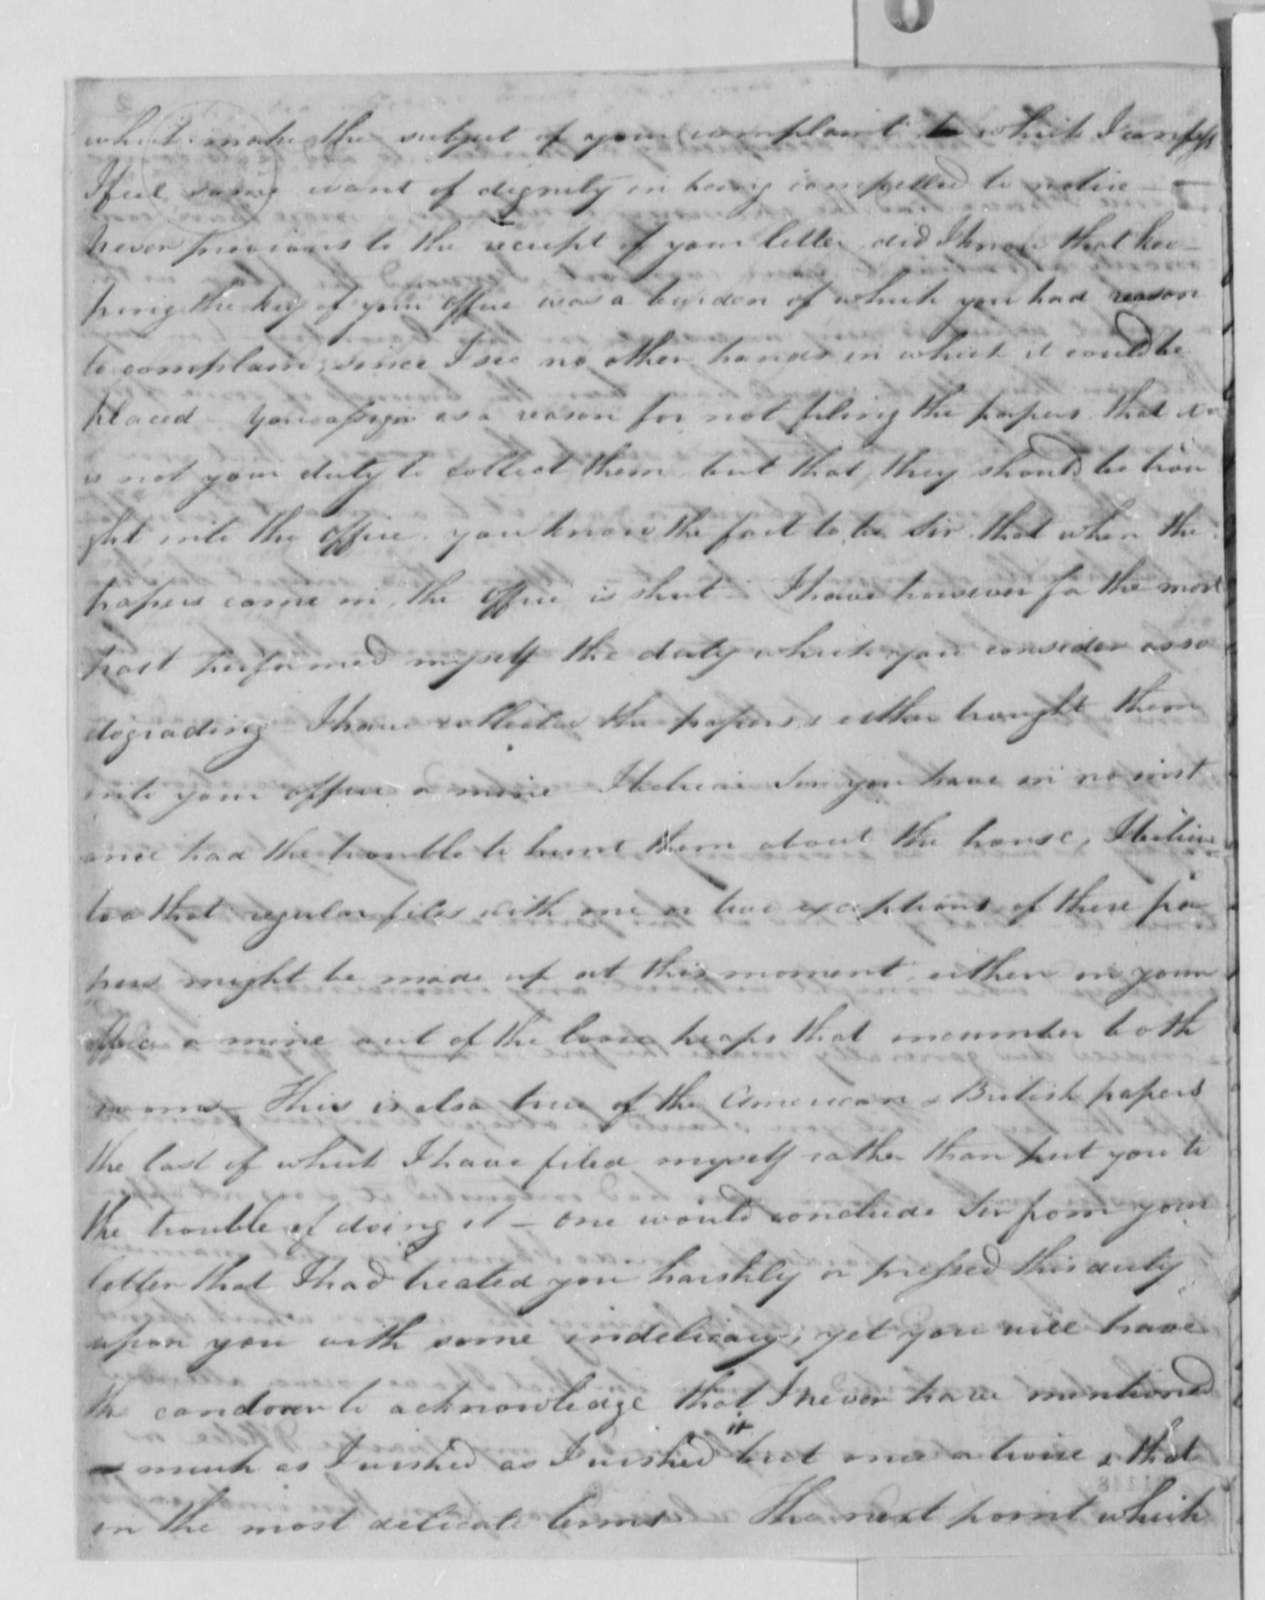 Robert R. Livingston to Thomas Sumter, Jr., April 27, 1802